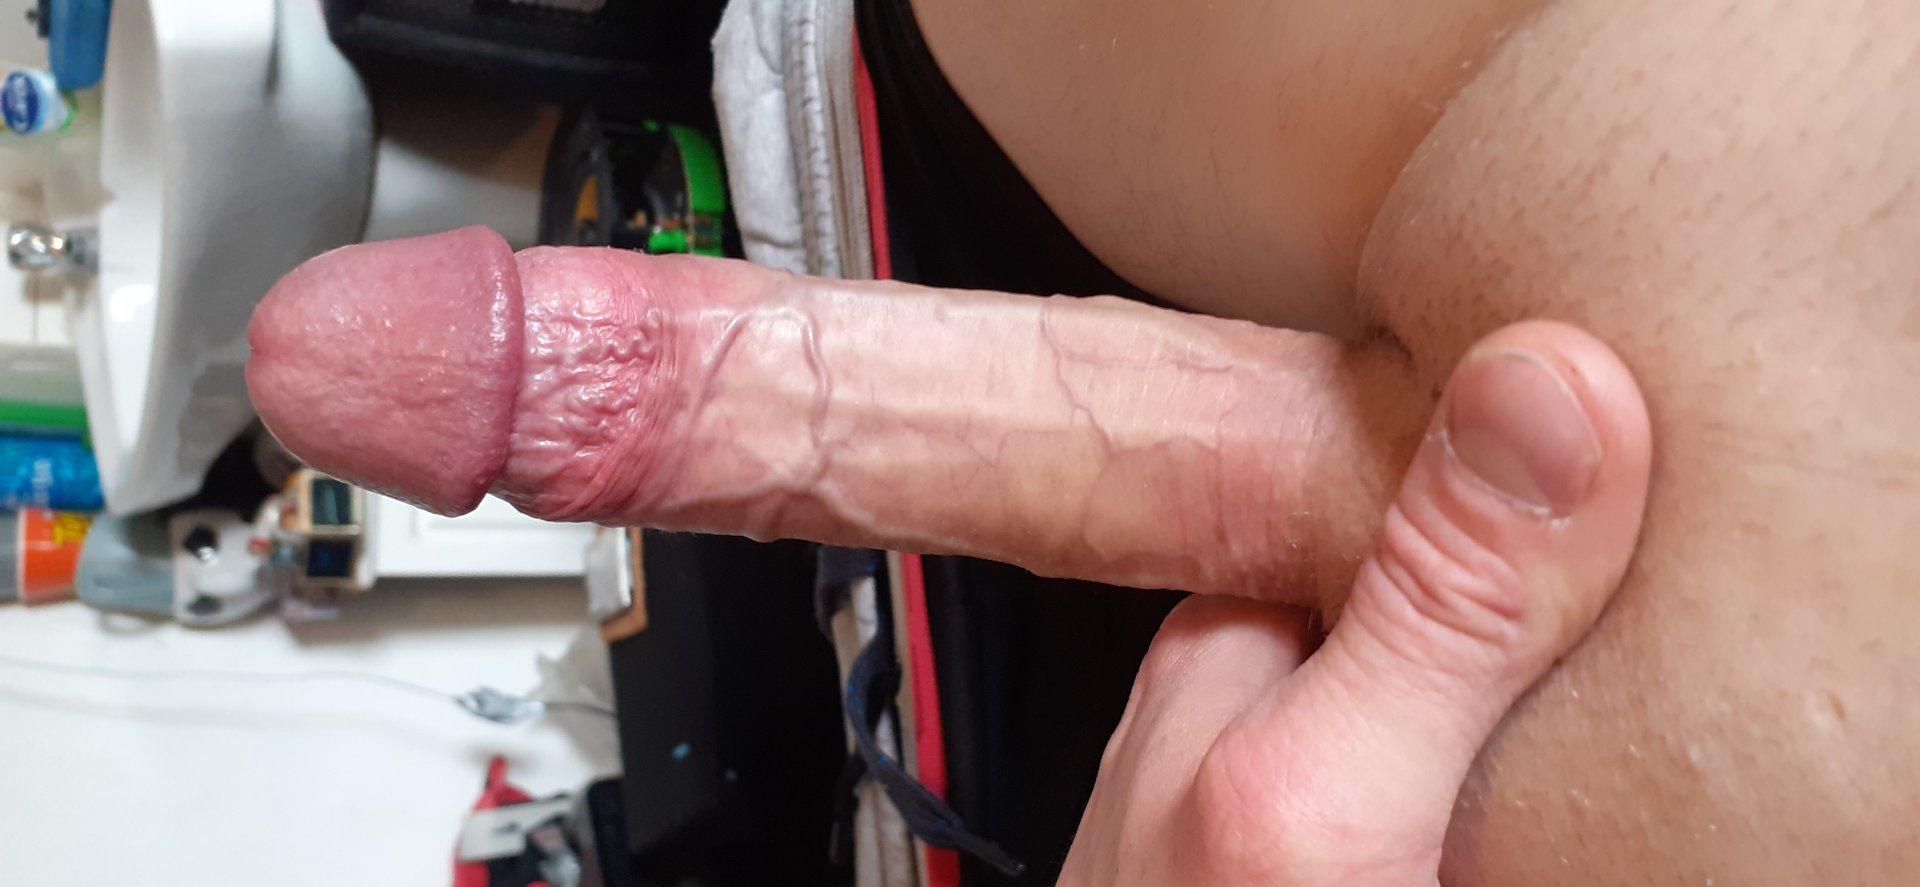 Tonyjezza87 from Newport,United Kingdom